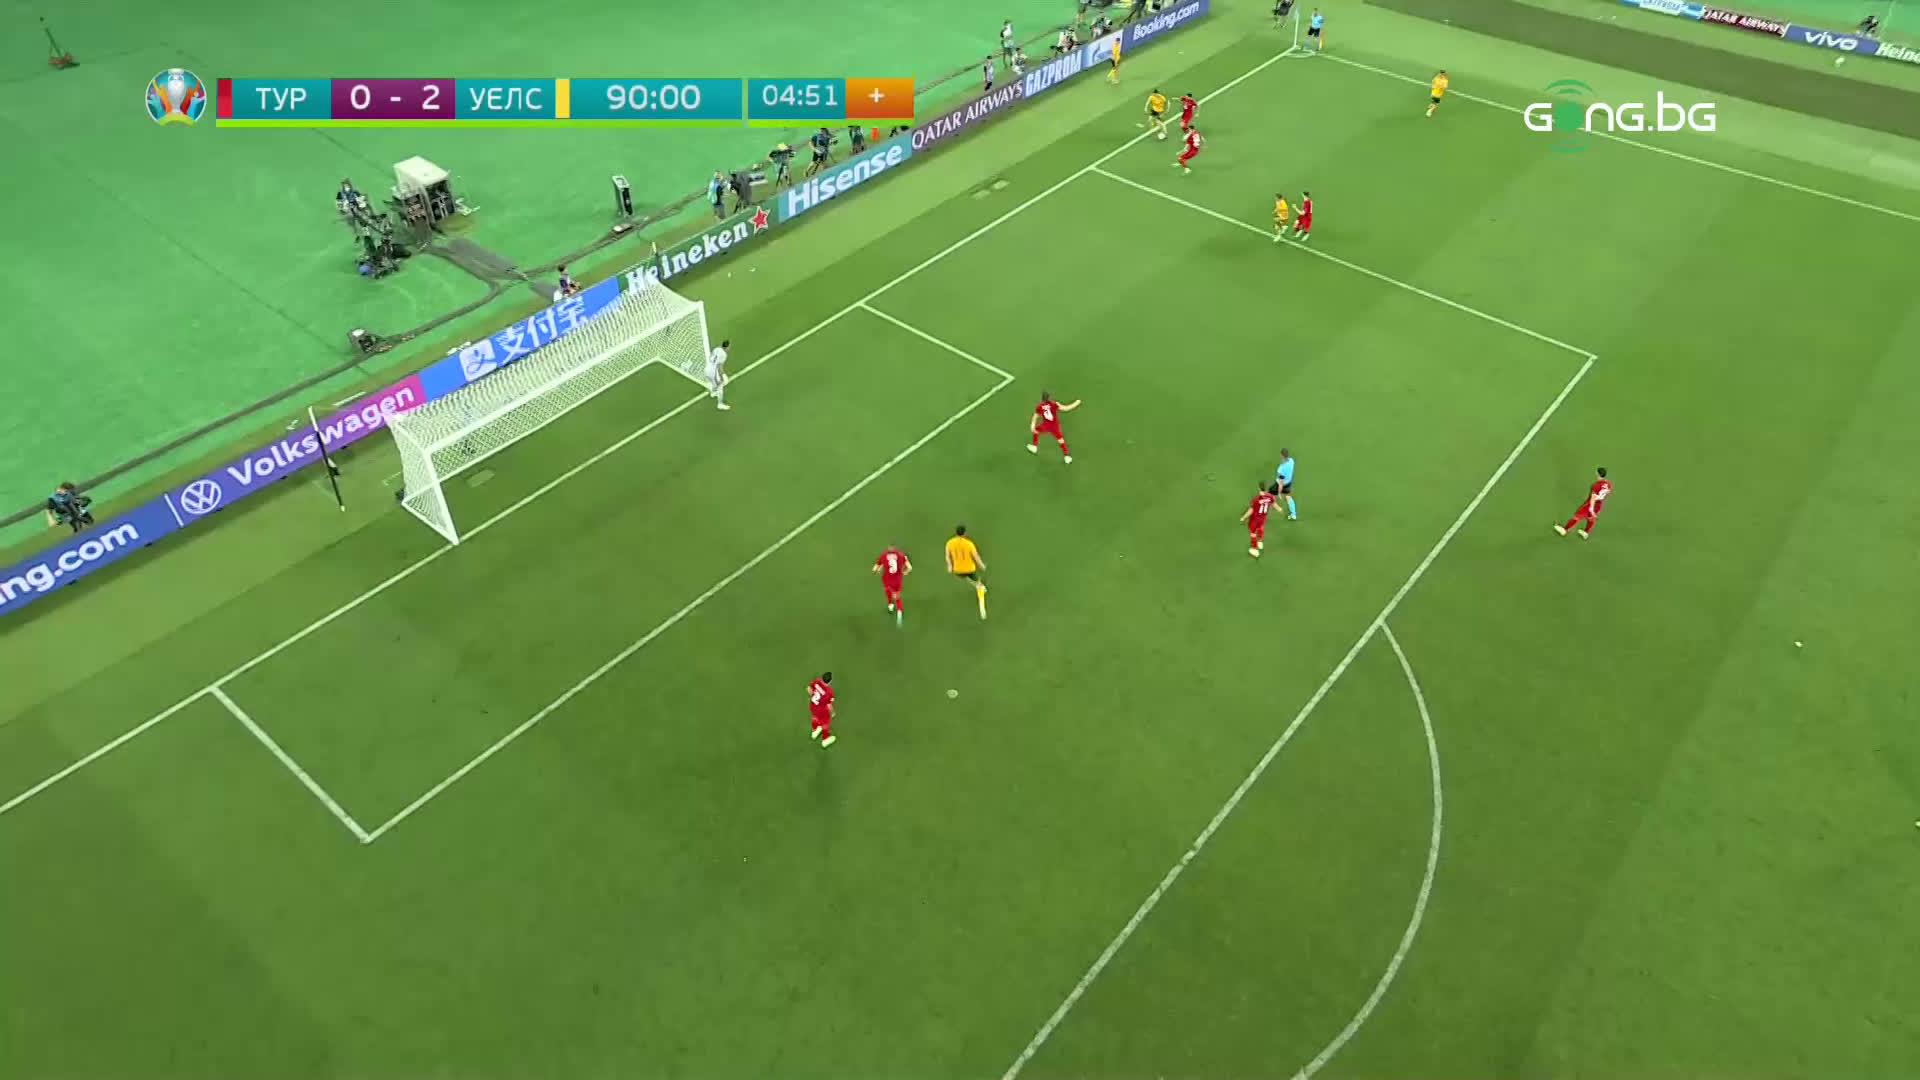 Турция - Уелс 0:2